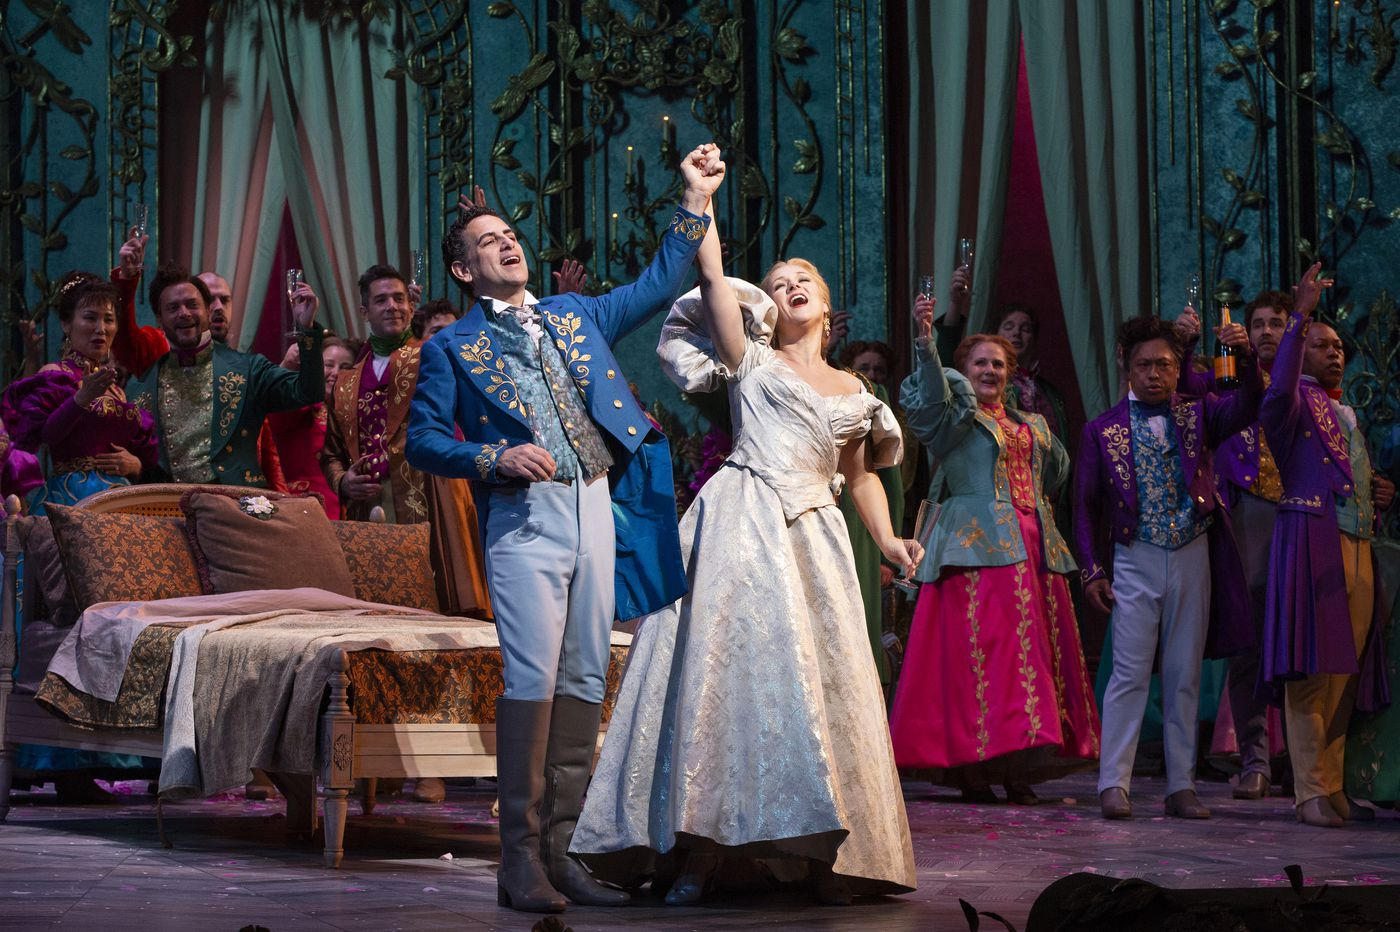 Yannick Nezet-Seguin's 'La Traviata' at the Met brings down the house